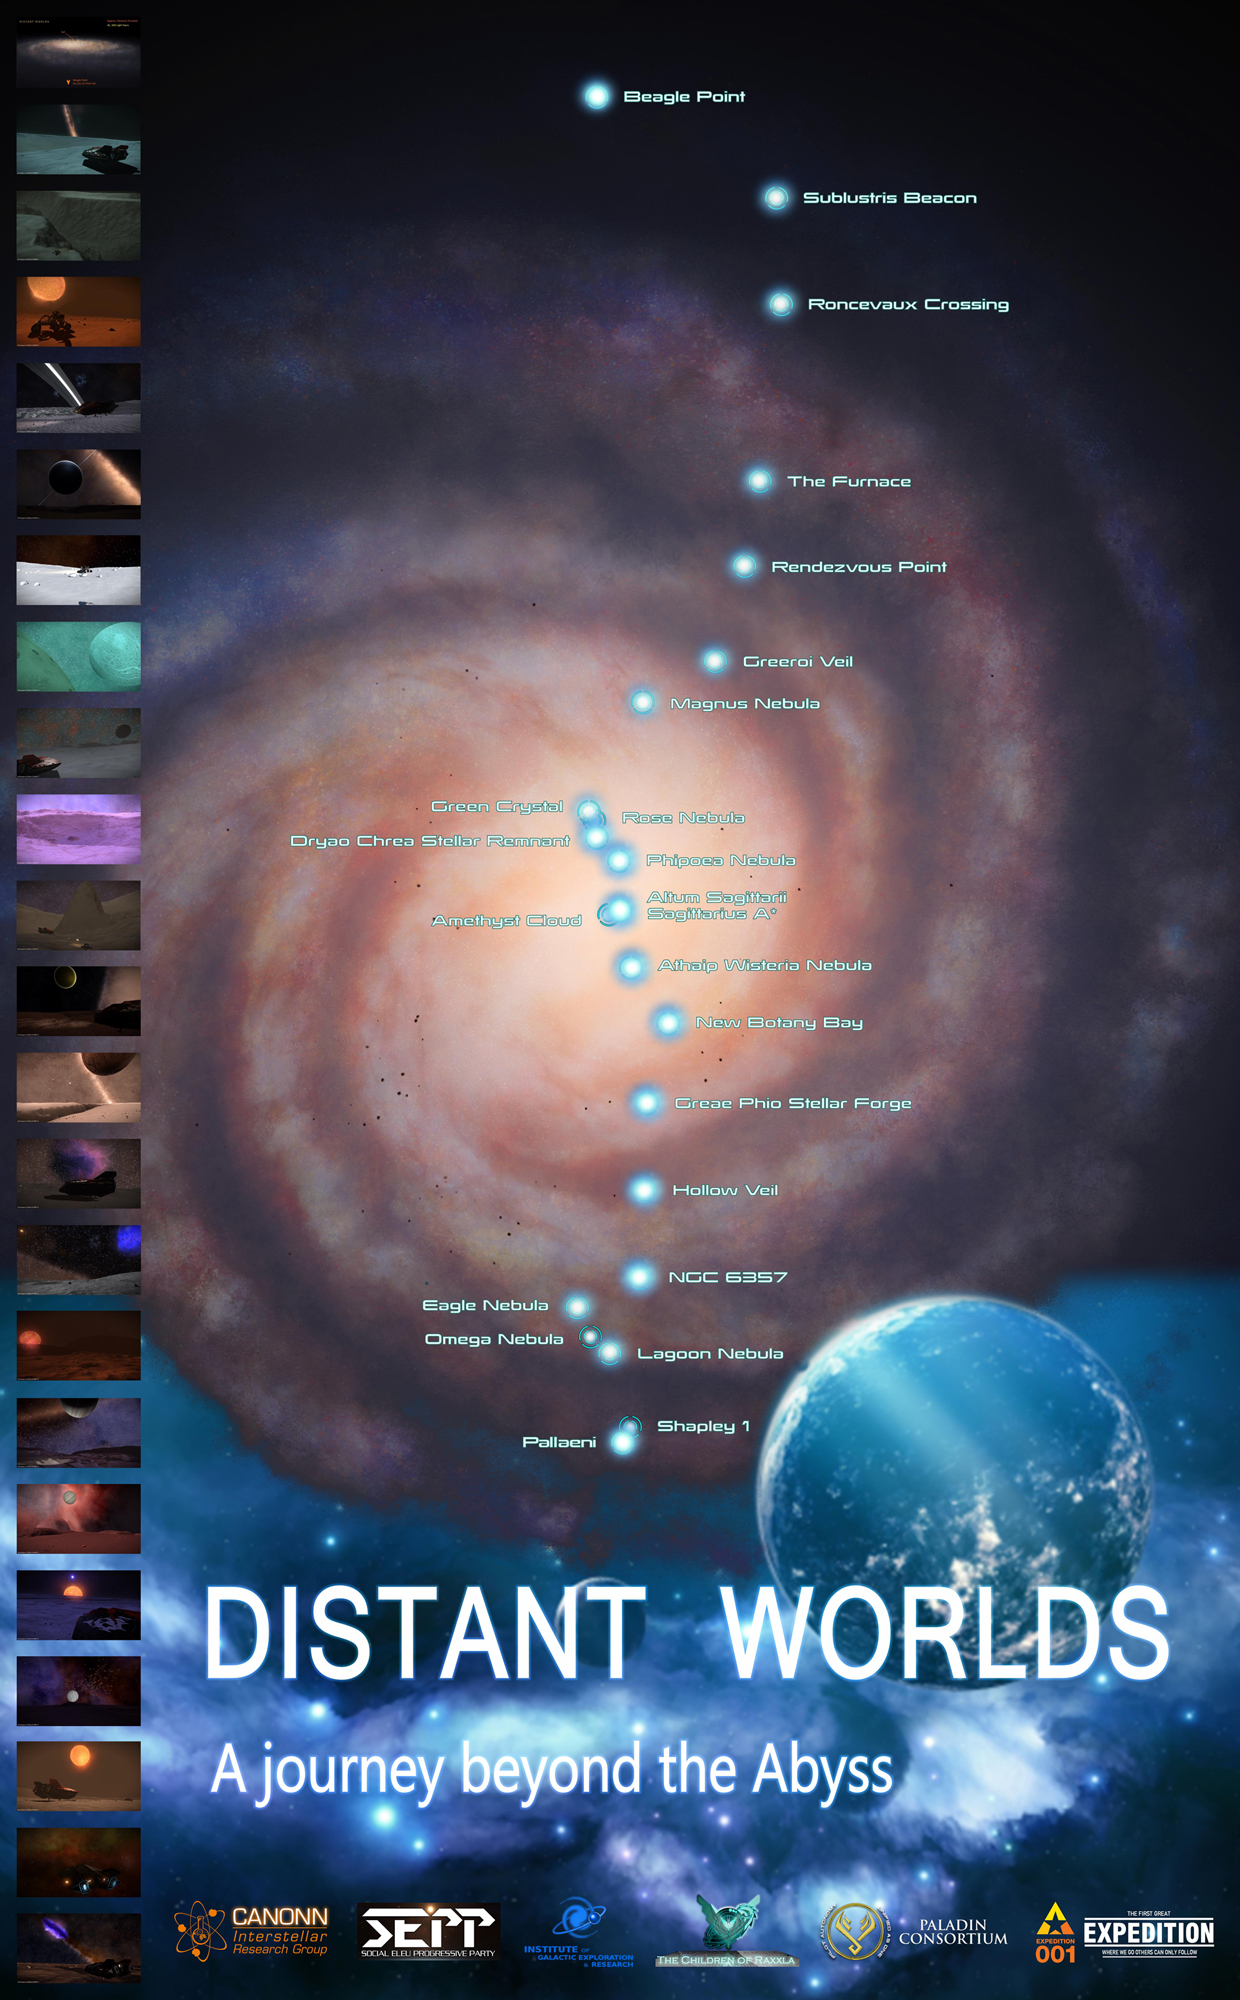 image official distant worlds poster jpg elite dangerous wiki